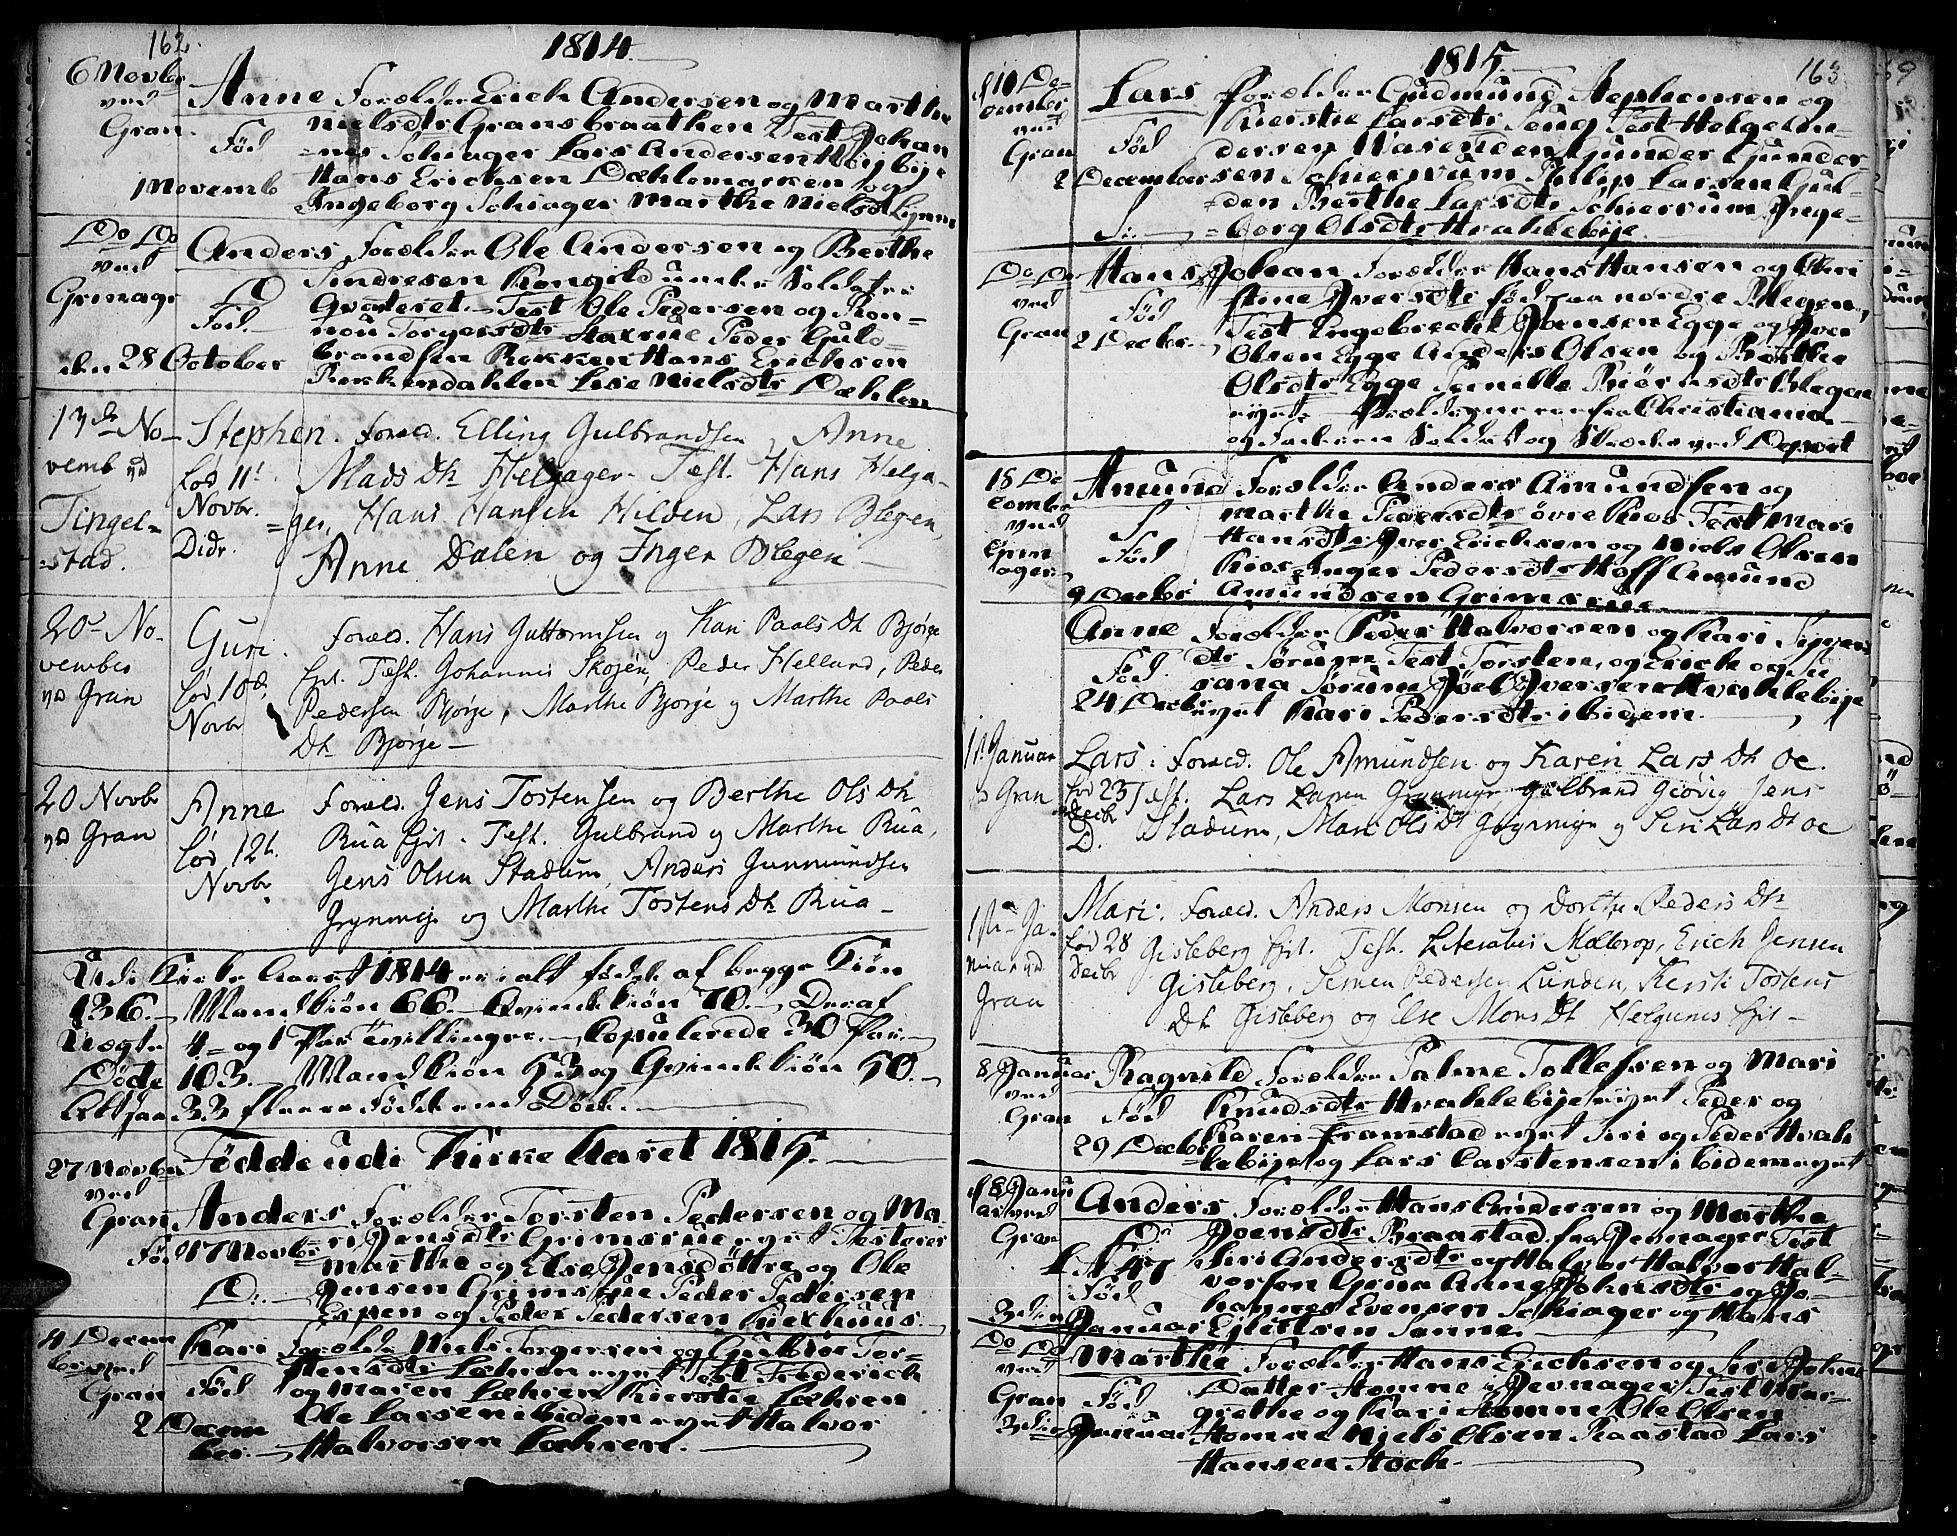 SAH, Gran prestekontor, Ministerialbok nr. 7, 1804-1815, s. 162-163